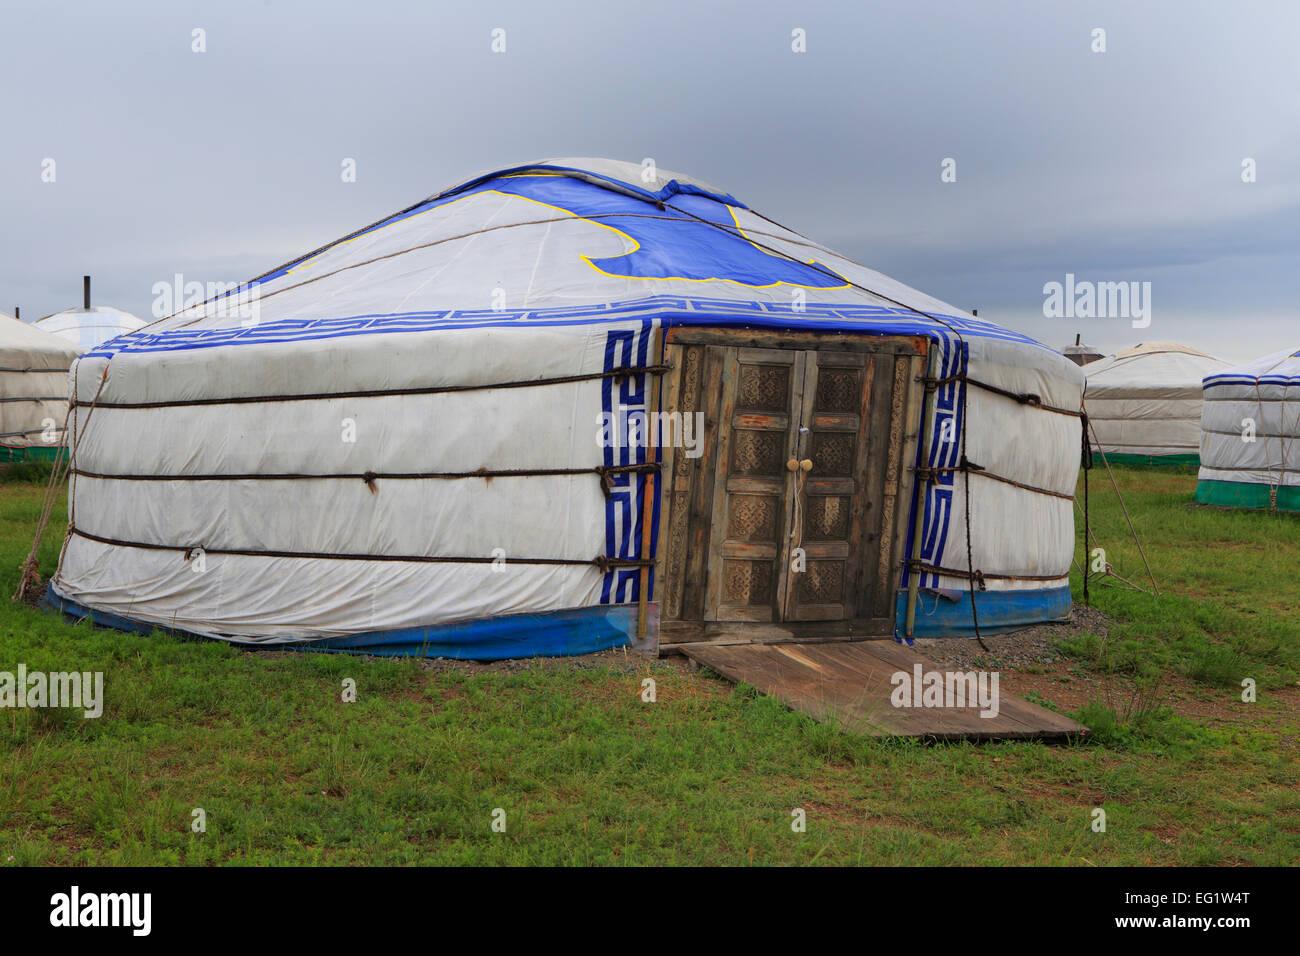 Traditional house in steppe, near Ogii lake, Arkhangai province, Mongolia - Stock Image